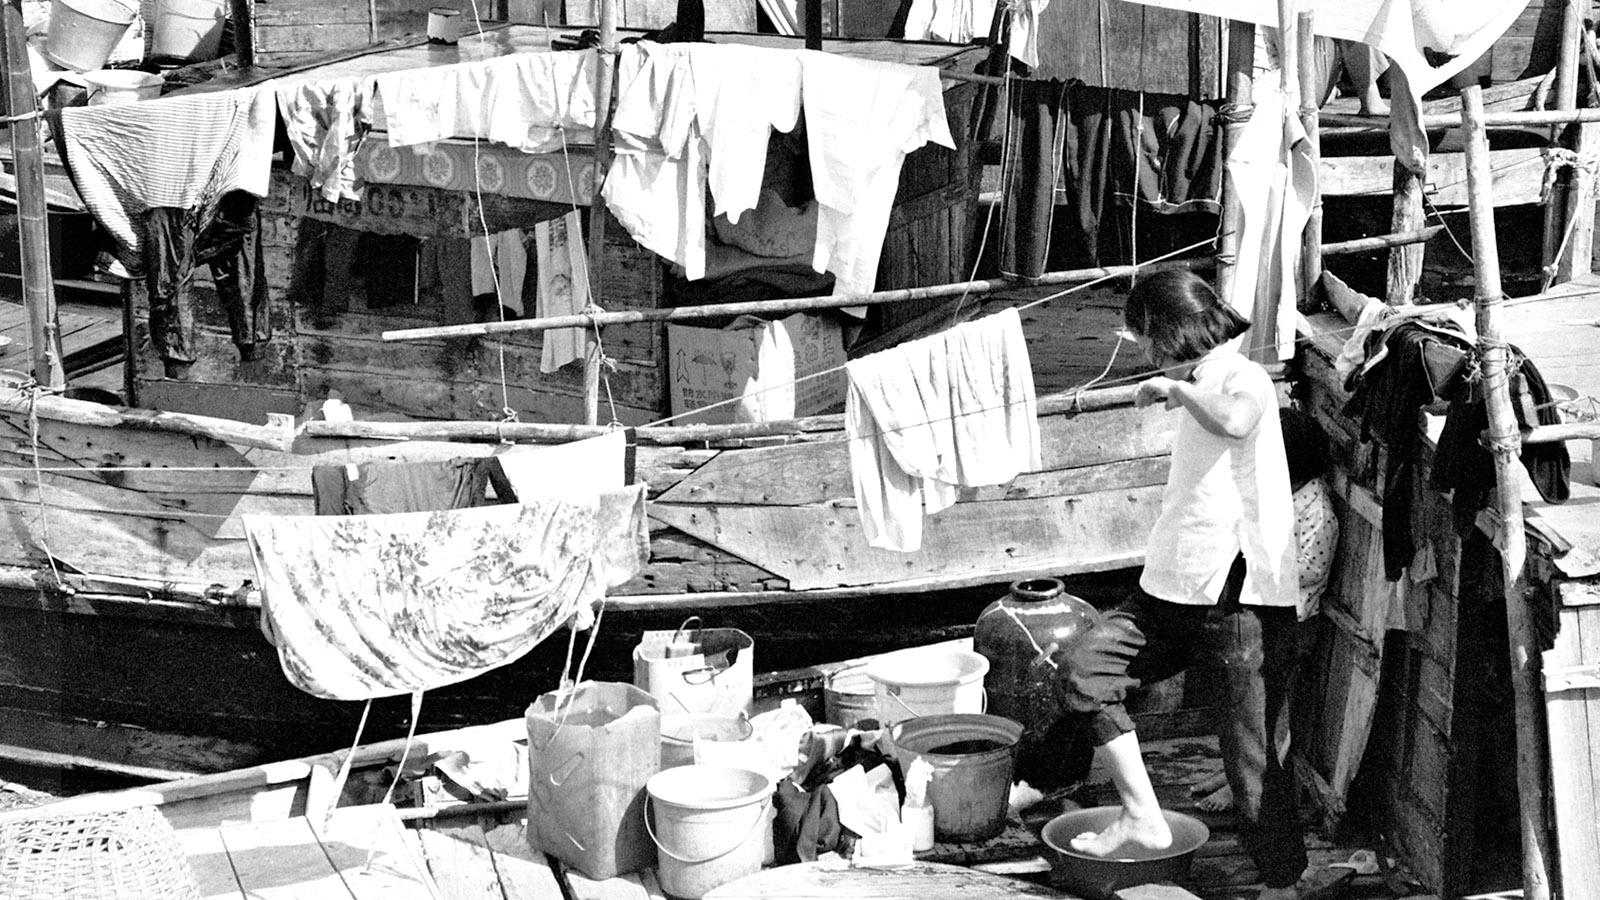 Hainan, Sanya Wohnboote_1990_Foto: Hilke Maunder